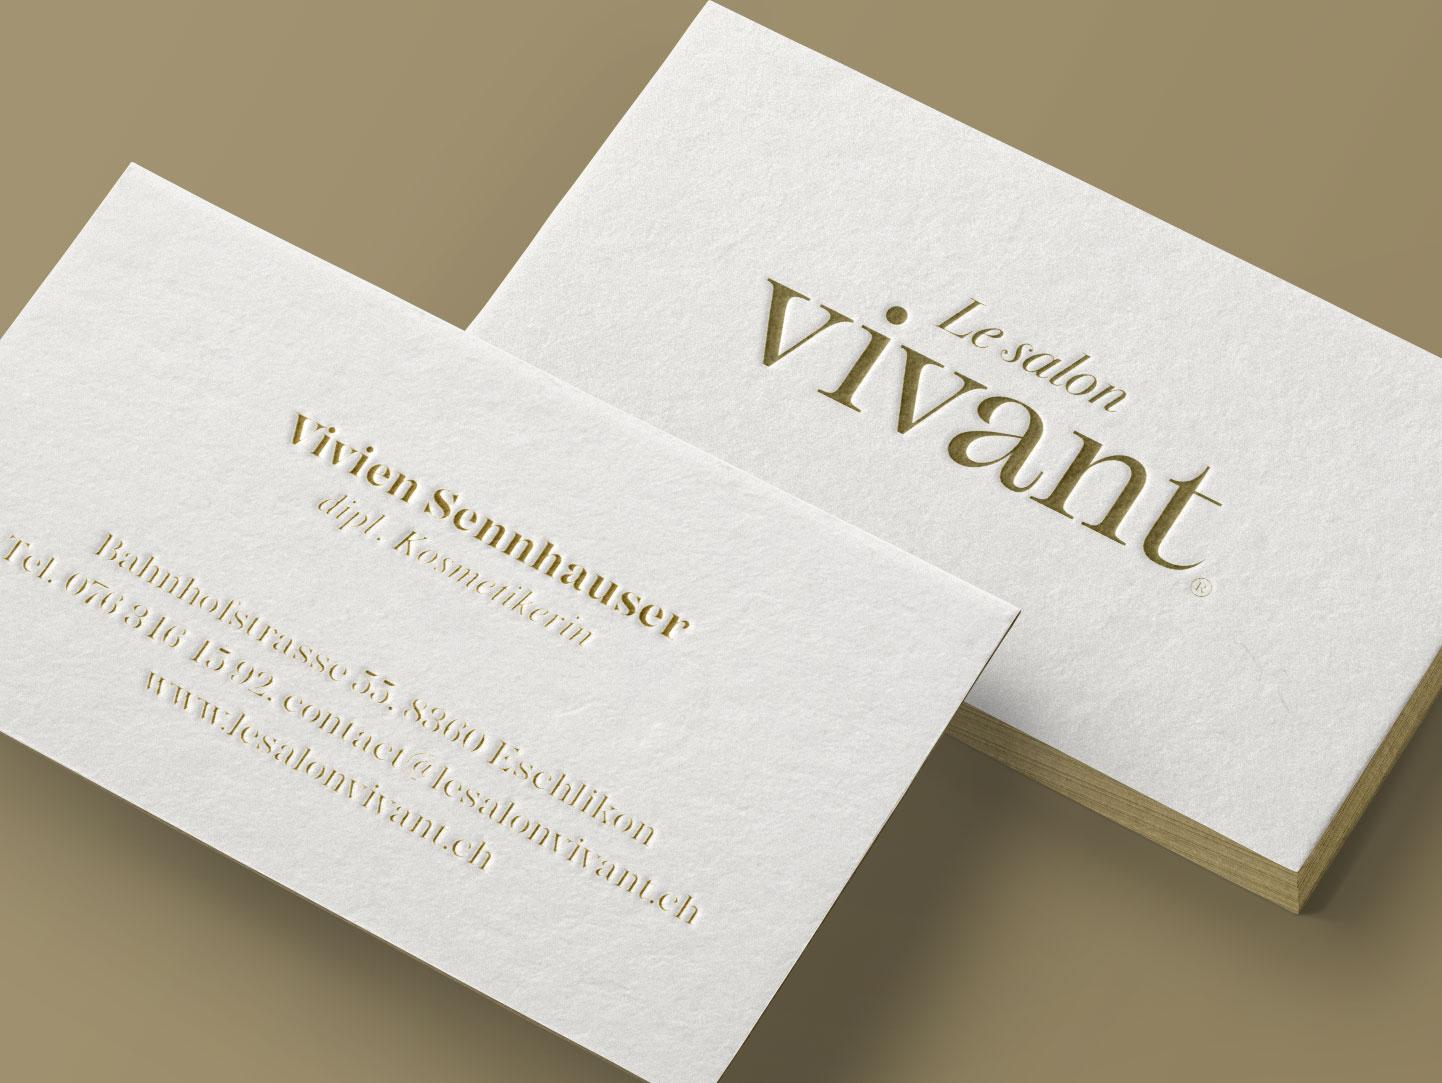 Vivant_02